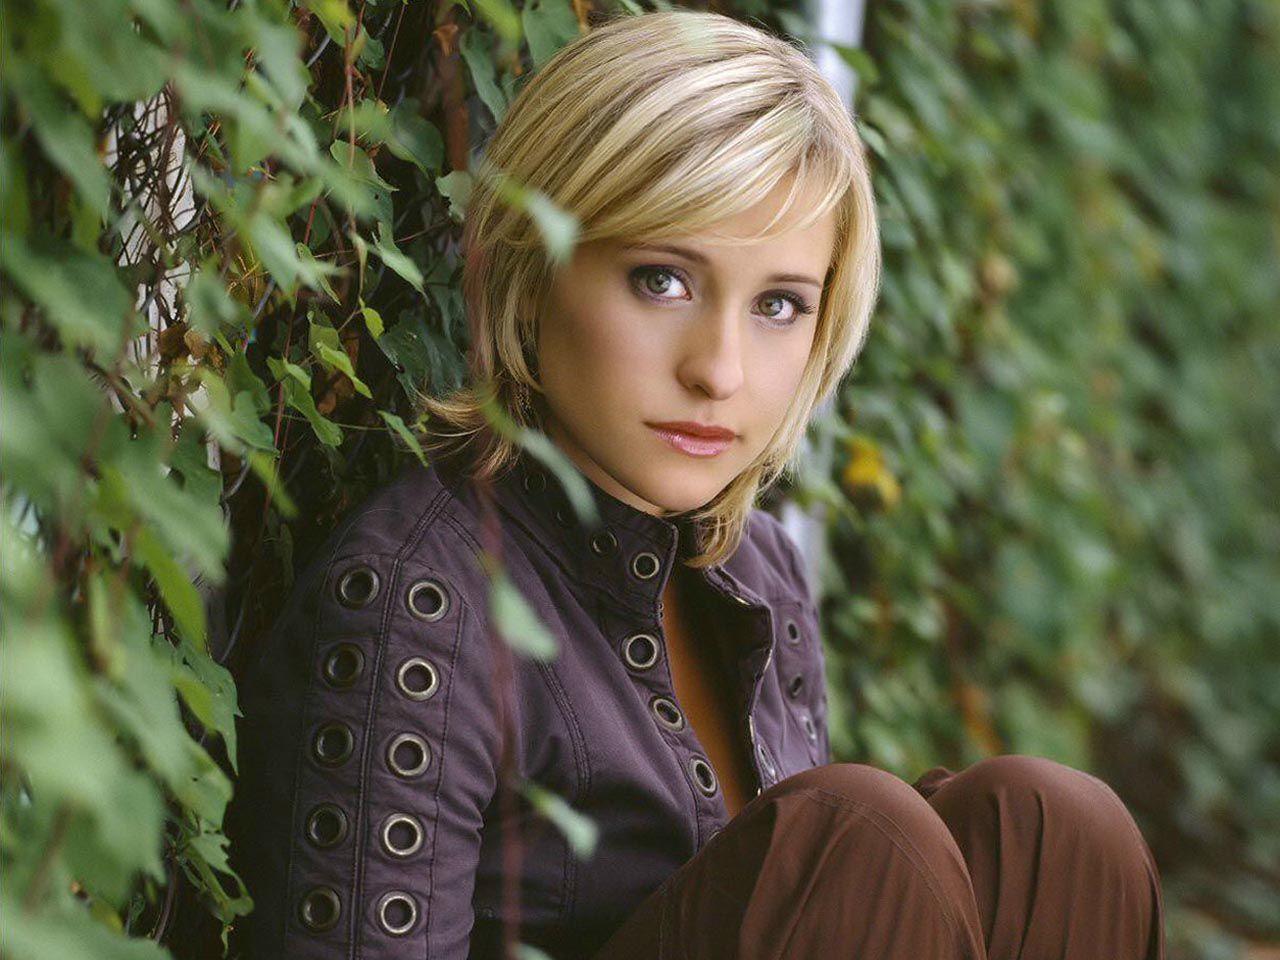 Chloe Sullivan Sitting Side Portrait Wallpaper 1280x960